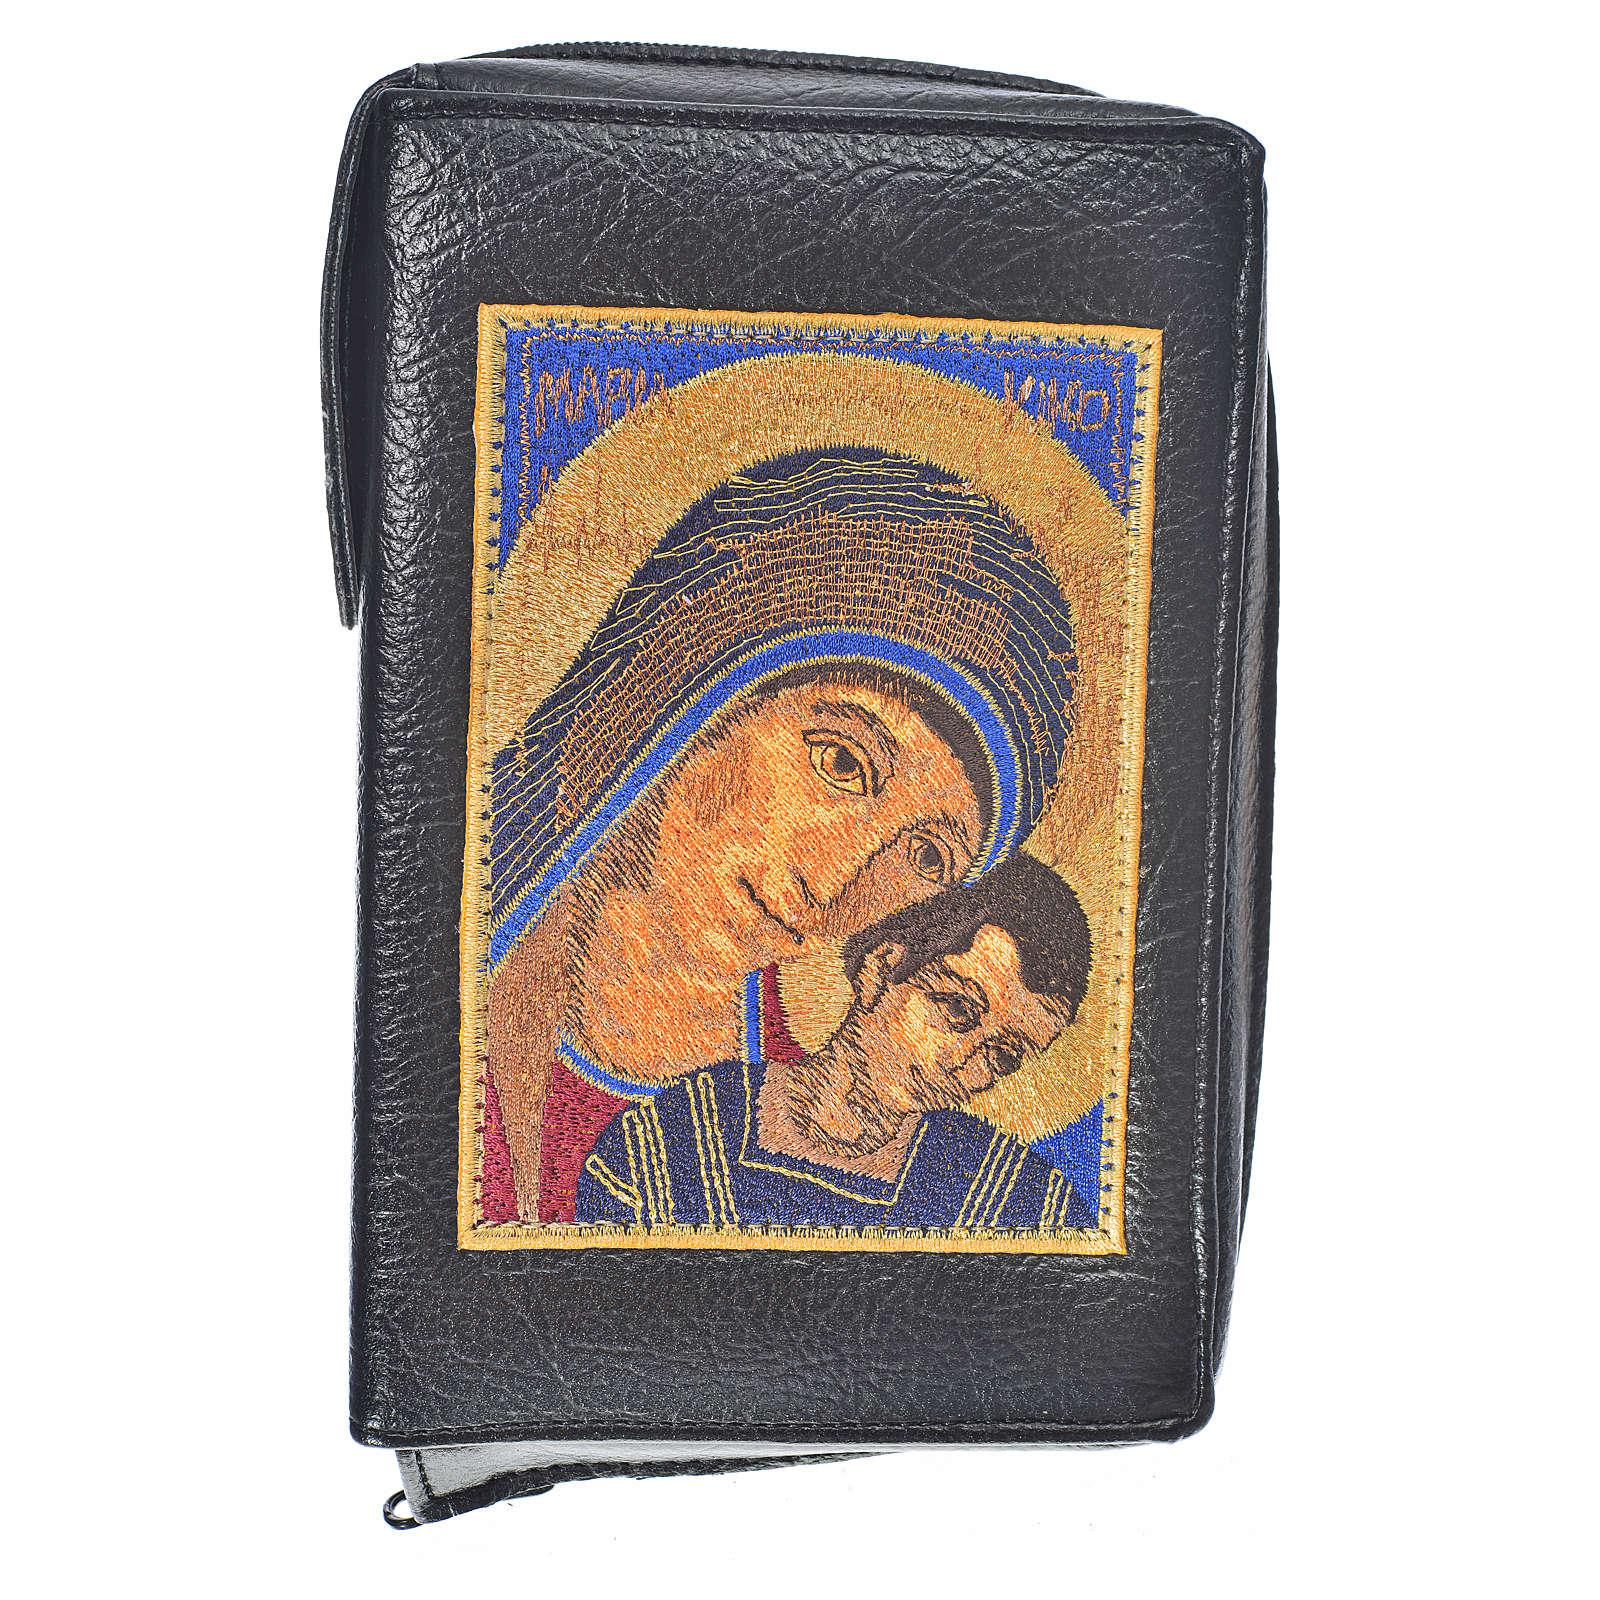 Funda Biblia Jerusalén Nueva Ed. negro simil cuero Virgen de Kiko 4